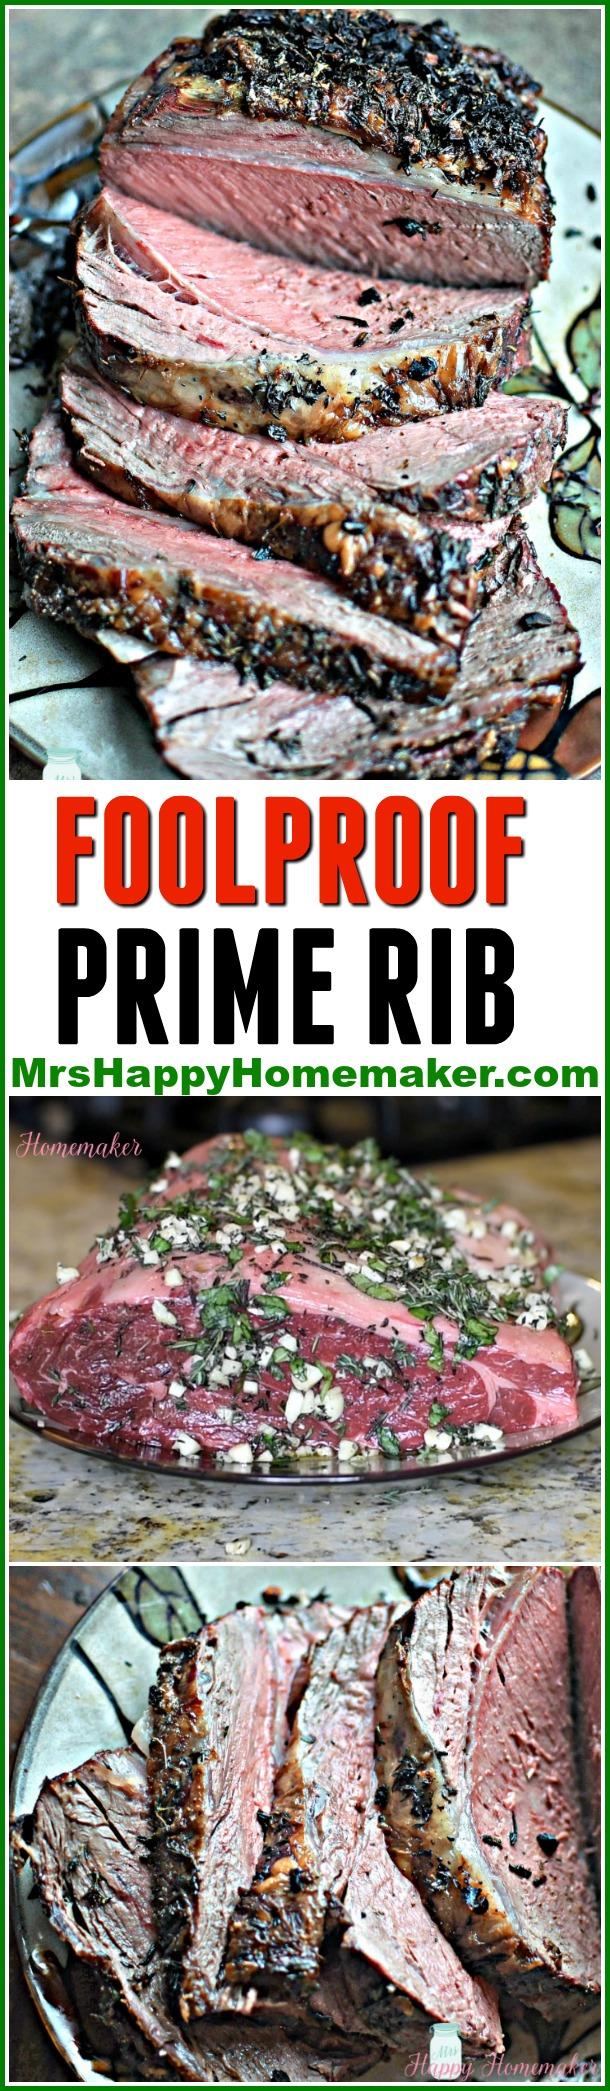 Foolproof Prime Rib | MrsHappyHomemaker.com